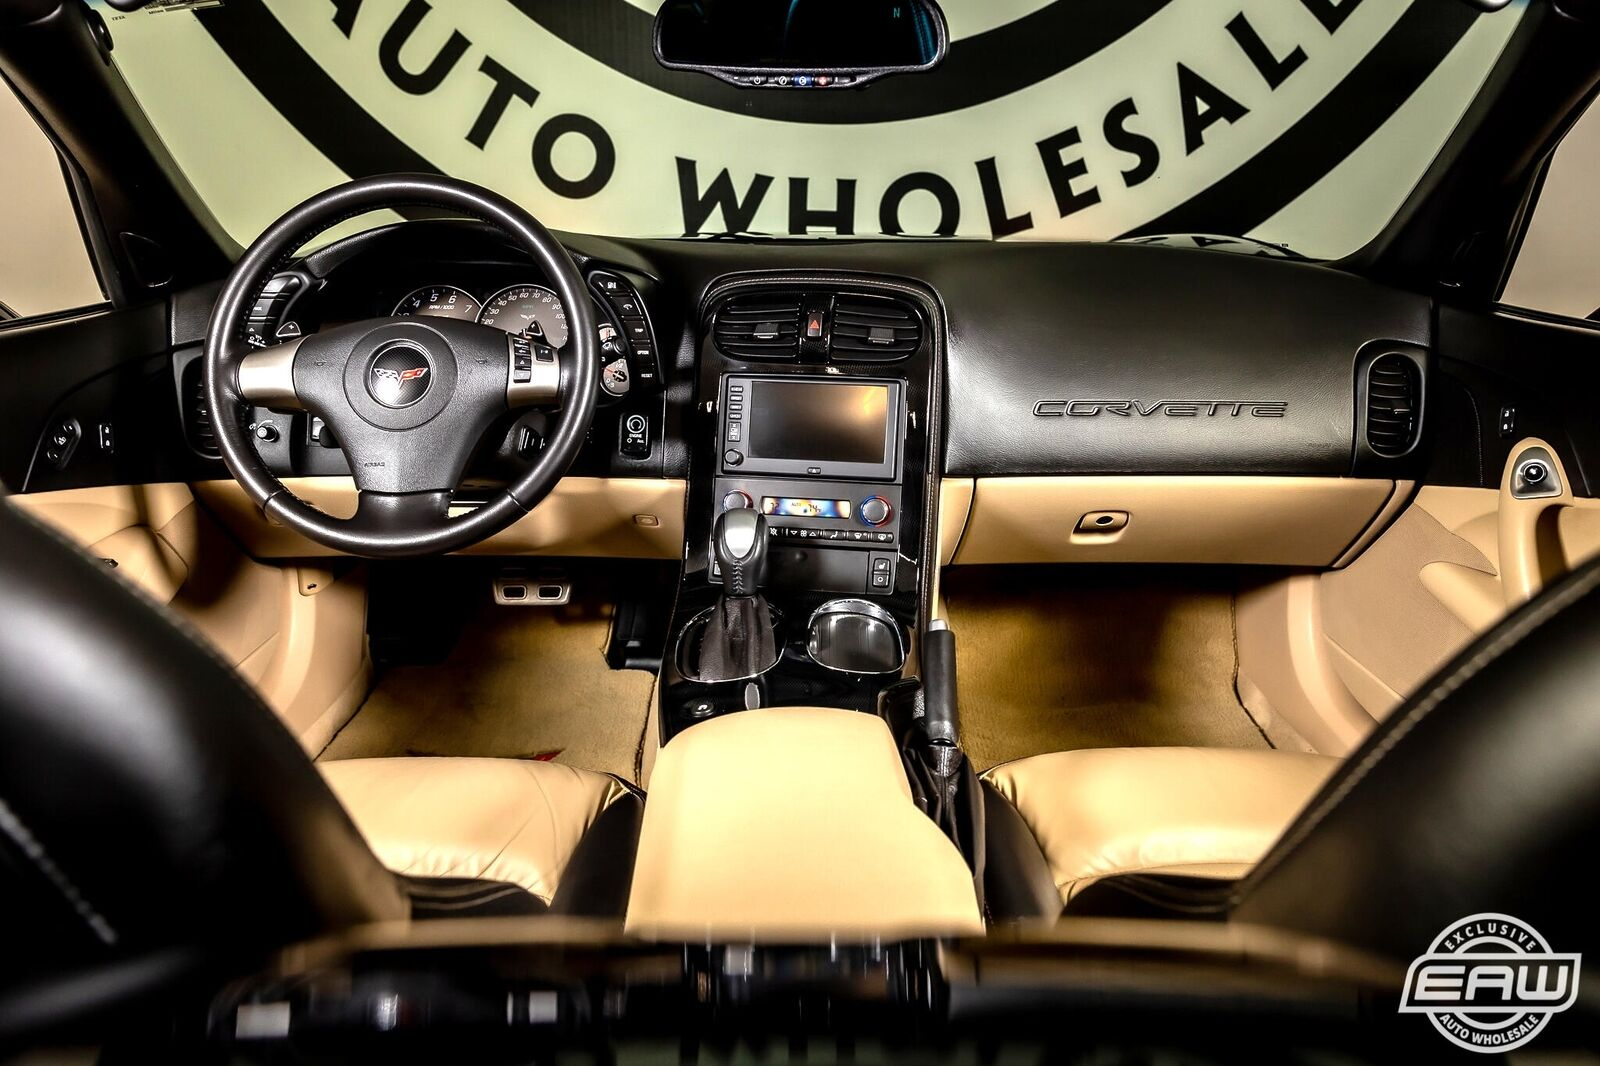 2008 Black Chevrolet Corvette Convertible  | C6 Corvette Photo 3